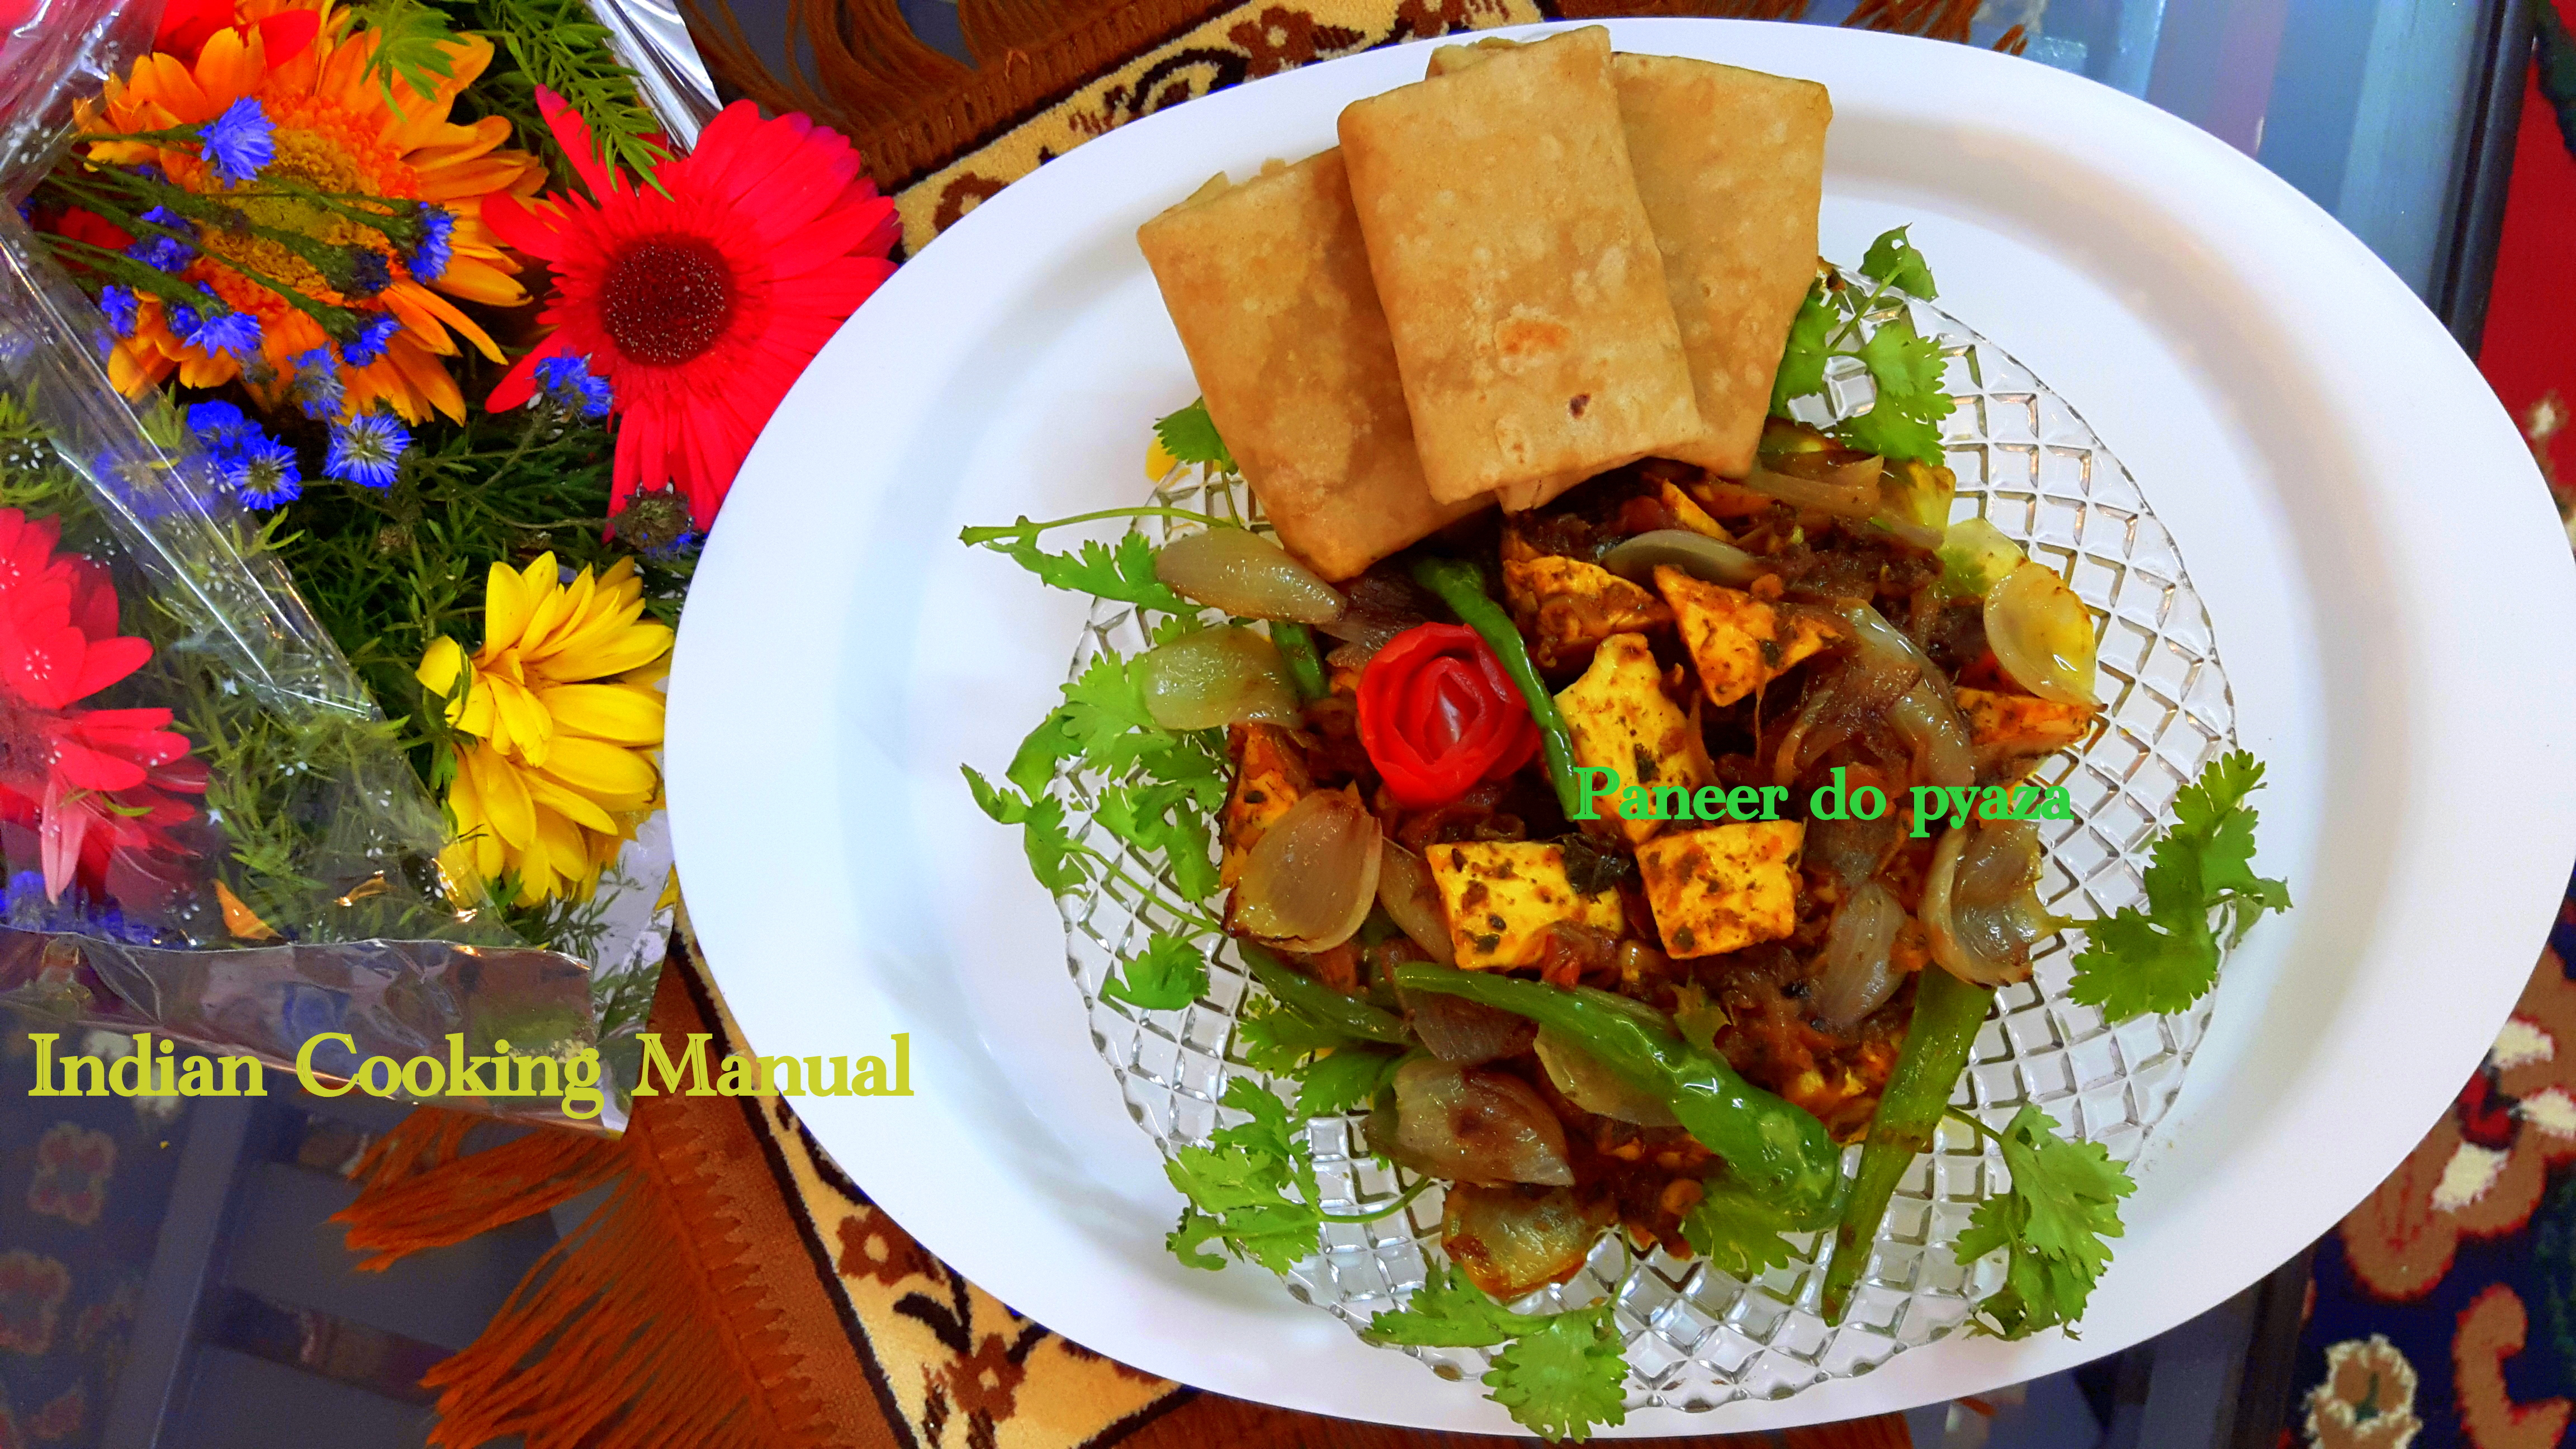 Paneer (cottage cheese) do pyaza